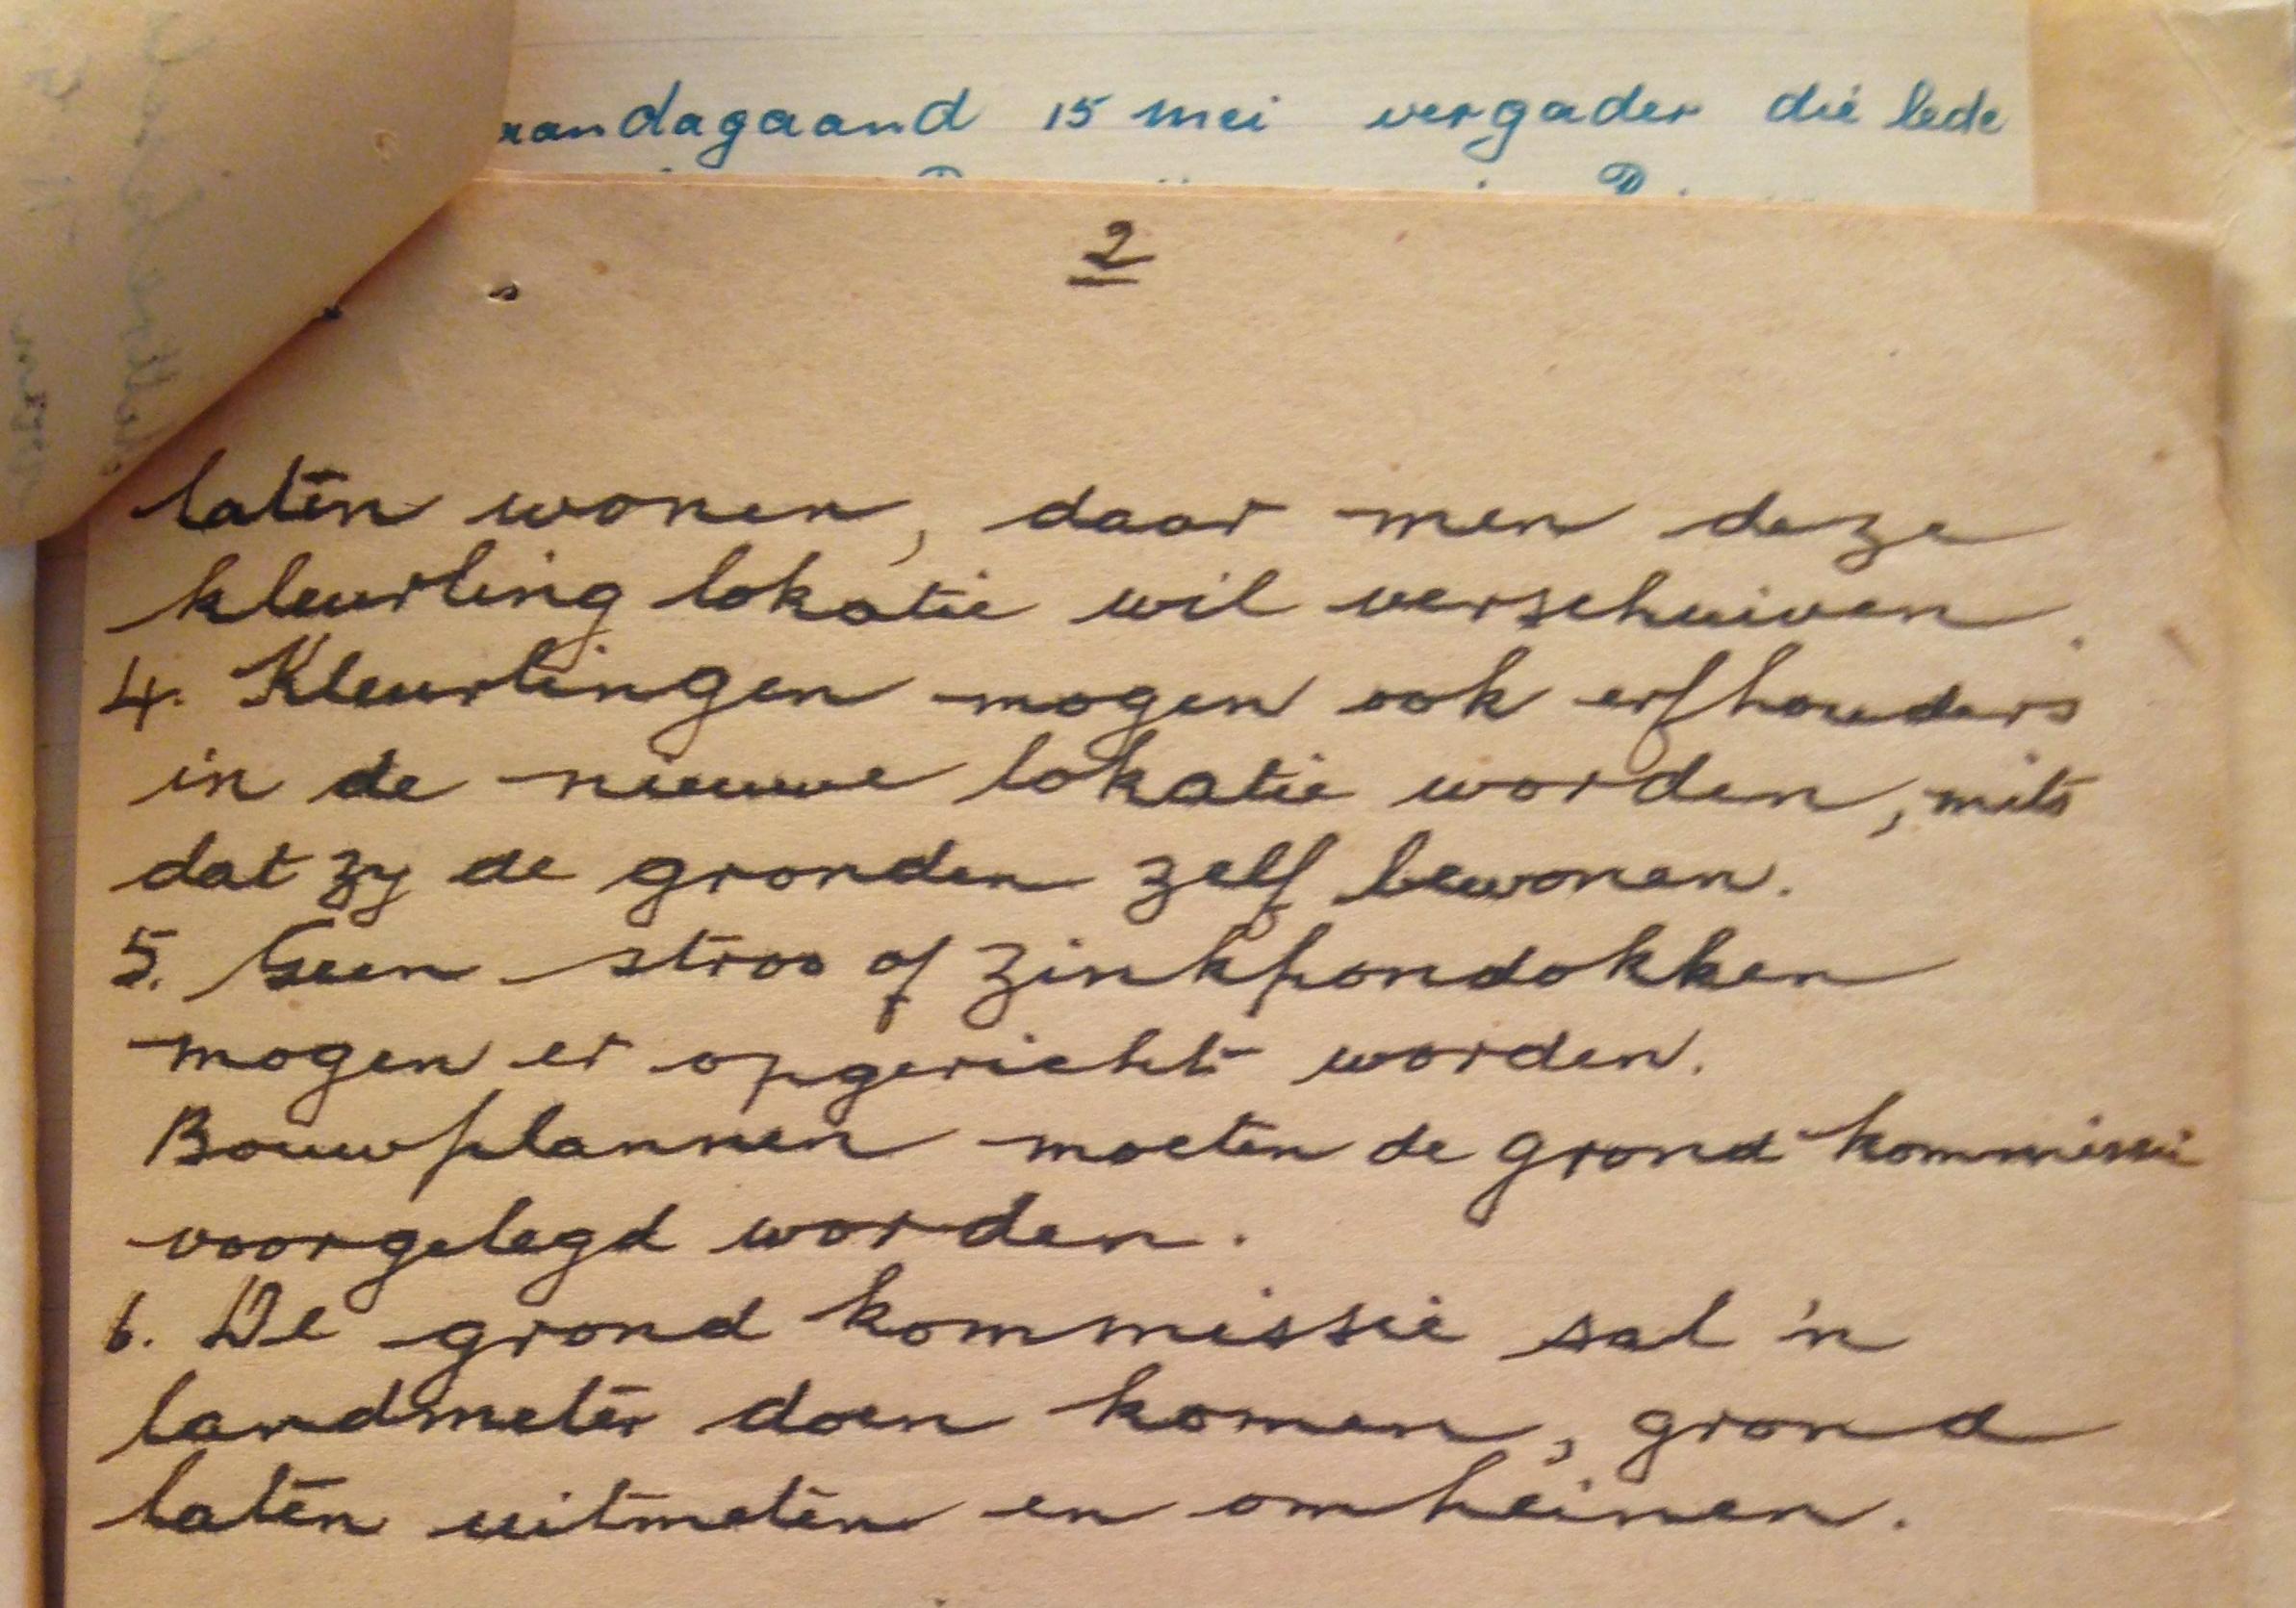 1919_IMG_2456 2 copy